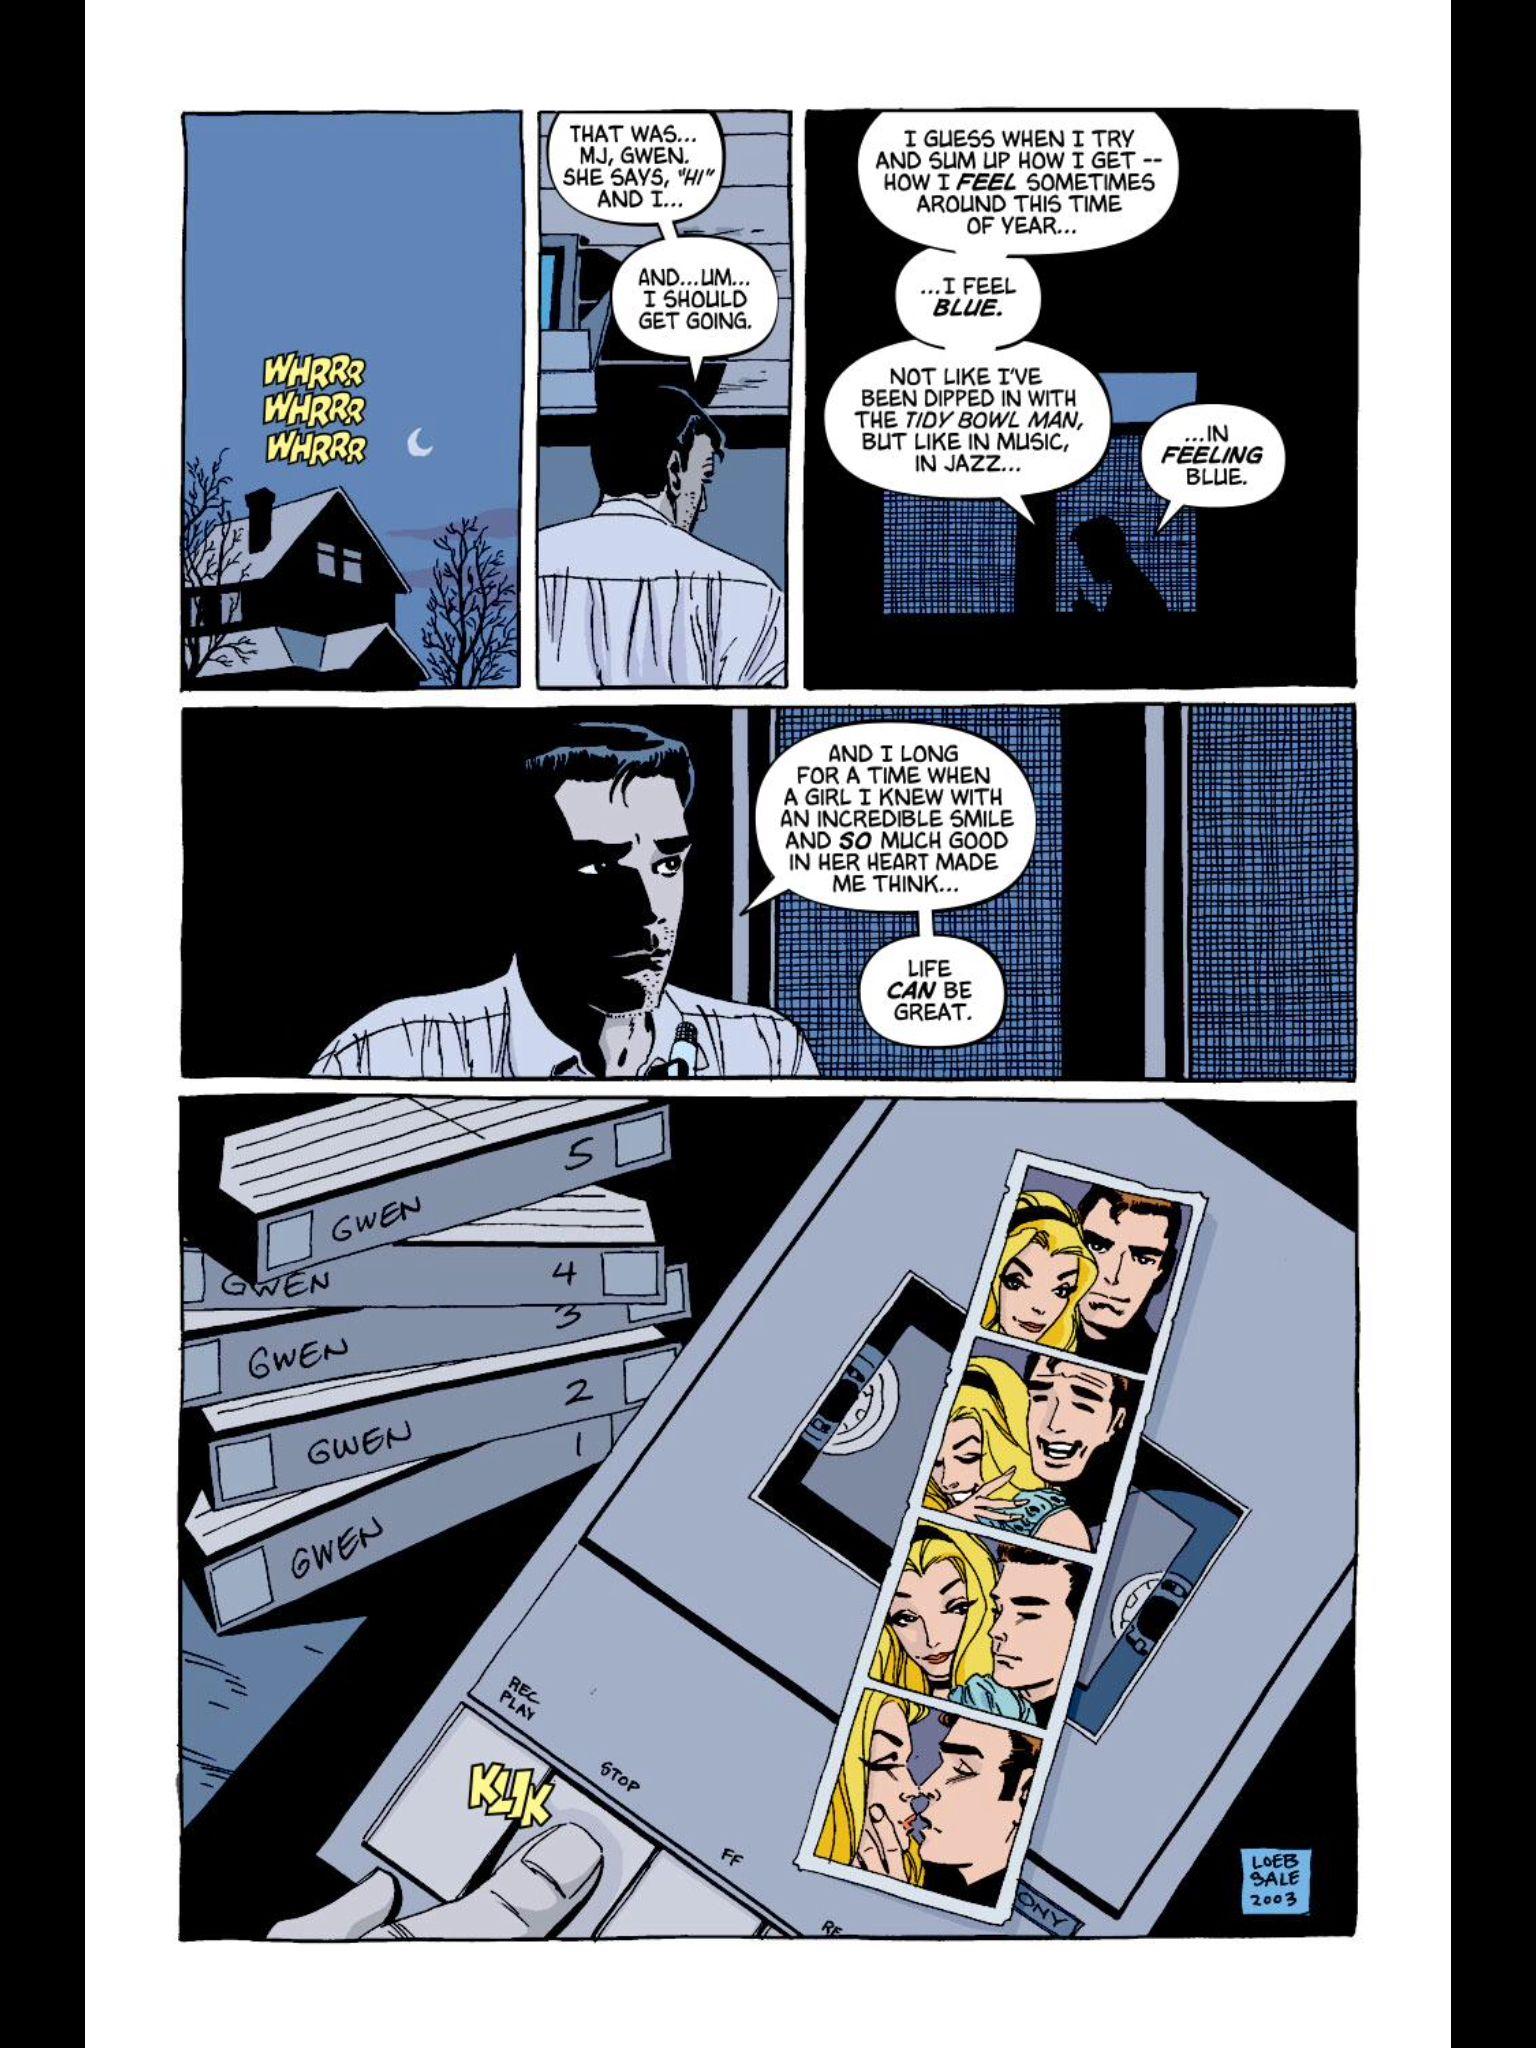 Spider Man Blue Ending So Emotional The Gwen Stories Always Hacks And Mods Blaspheme Clock Break My Heart